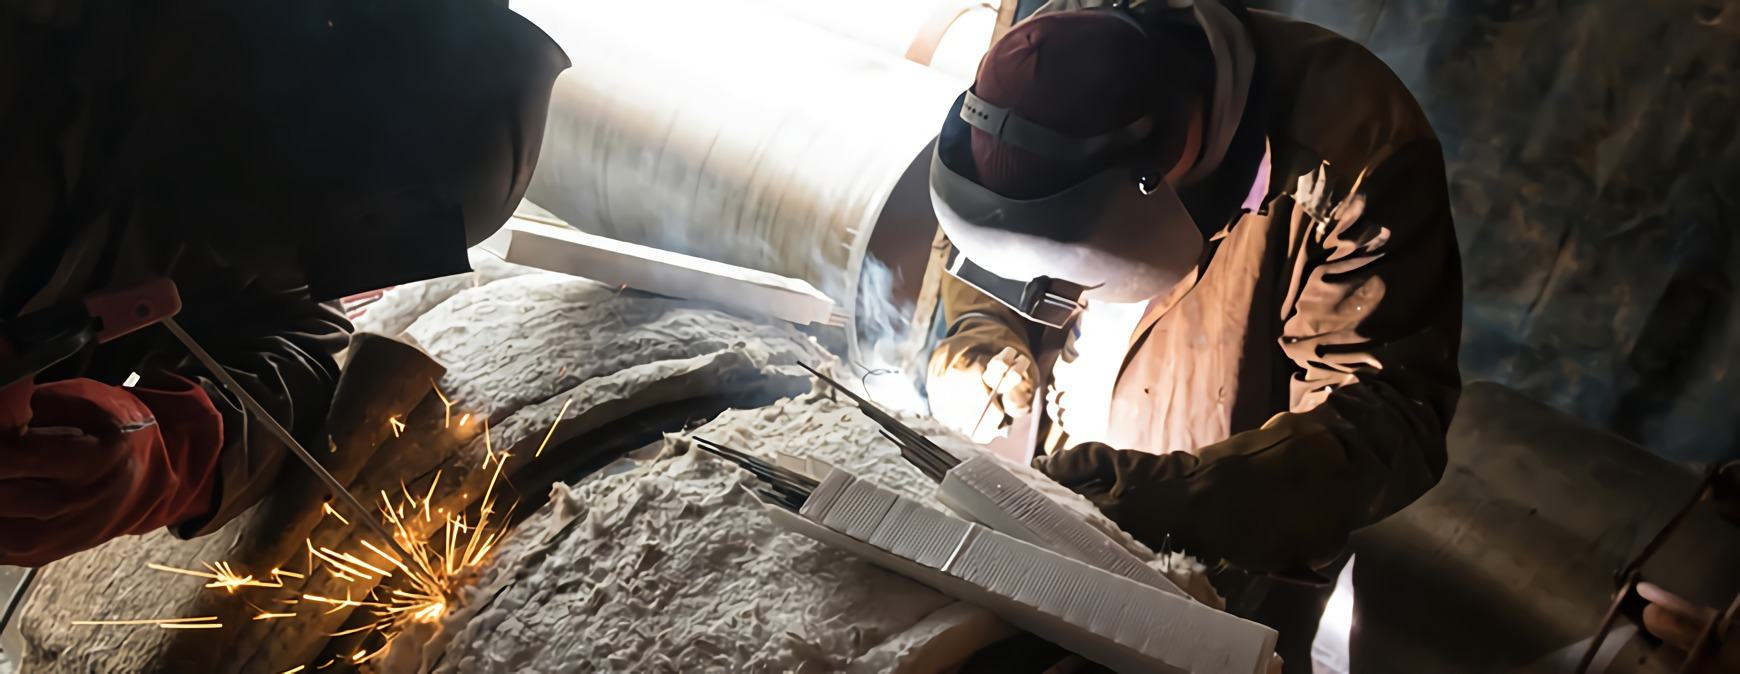 two welders pre heating pipe welding